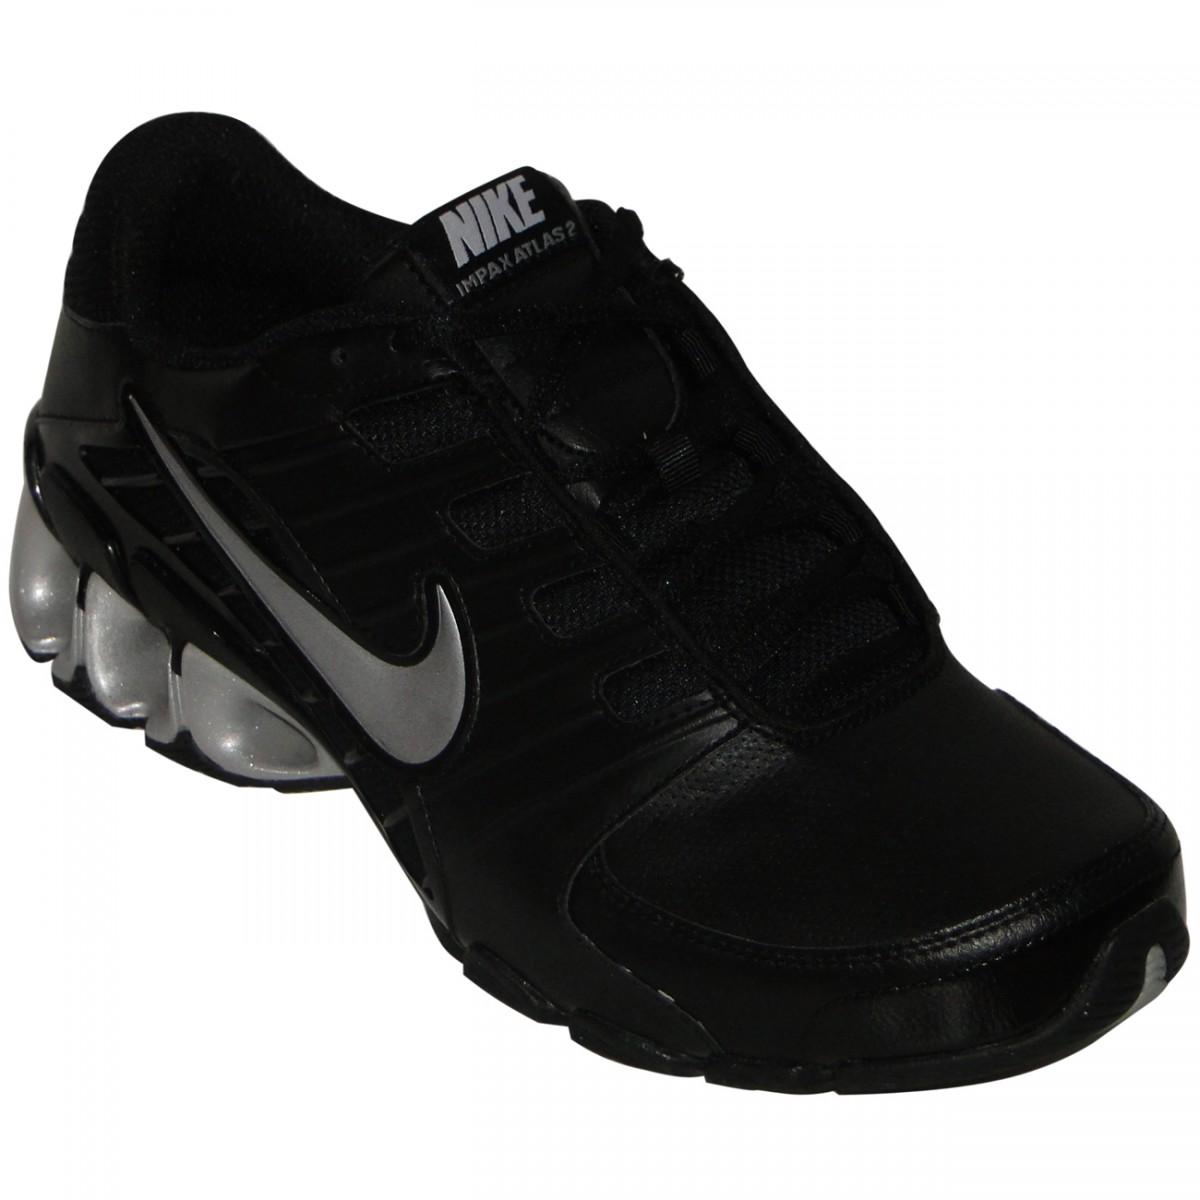 3b7bf55987 Tênis Nike Impax Atlas 2 Sl 3650 - PRETO PRATA - Chuteira Nike ...